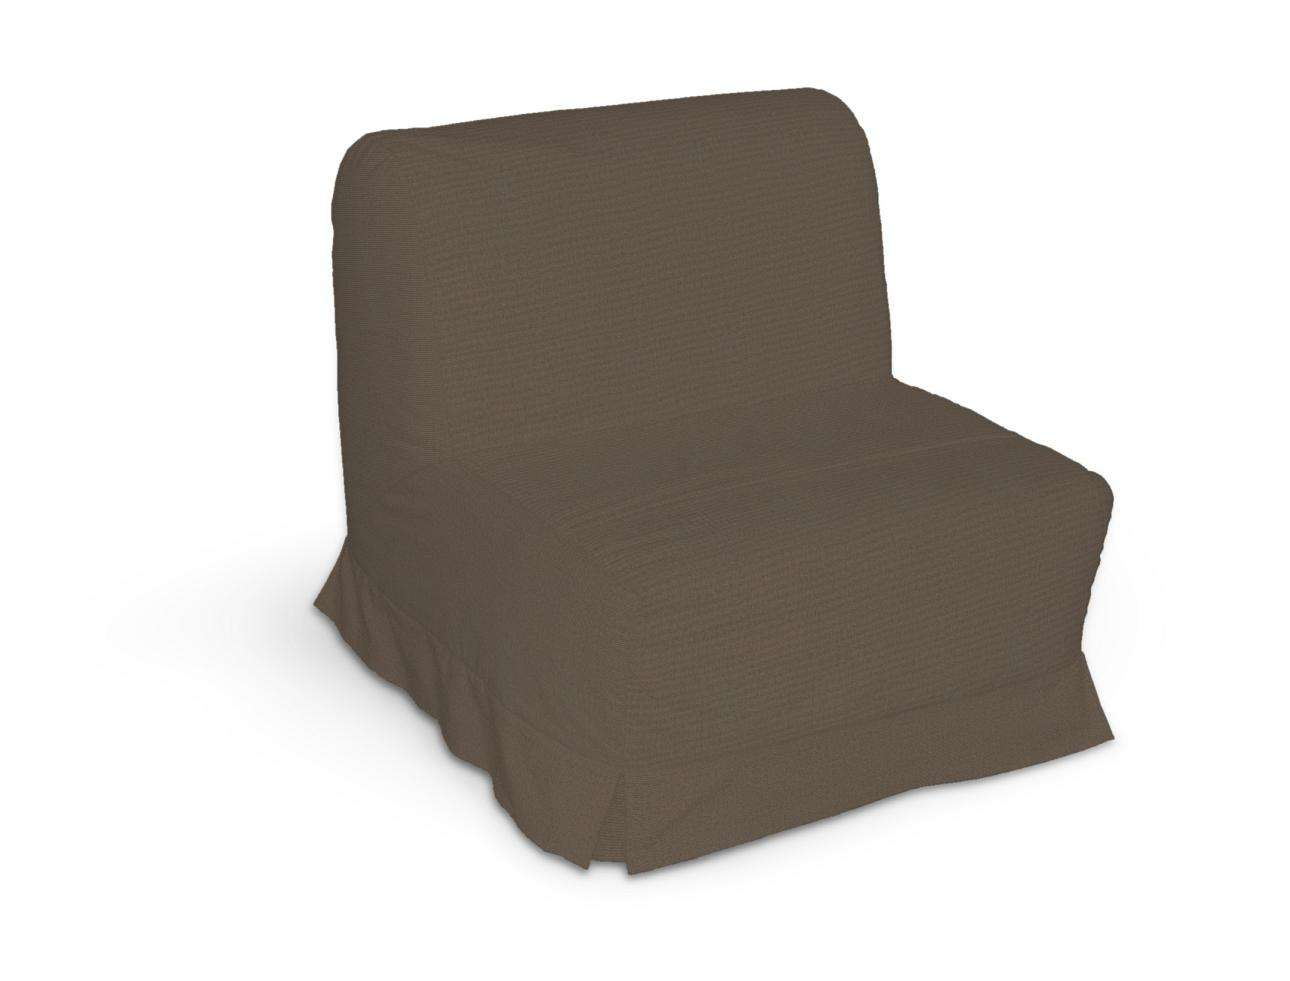 Lycksele Sesselbezug mit Kellerfalten Lycksele von der Kollektion Etna, Stoff: 705-08